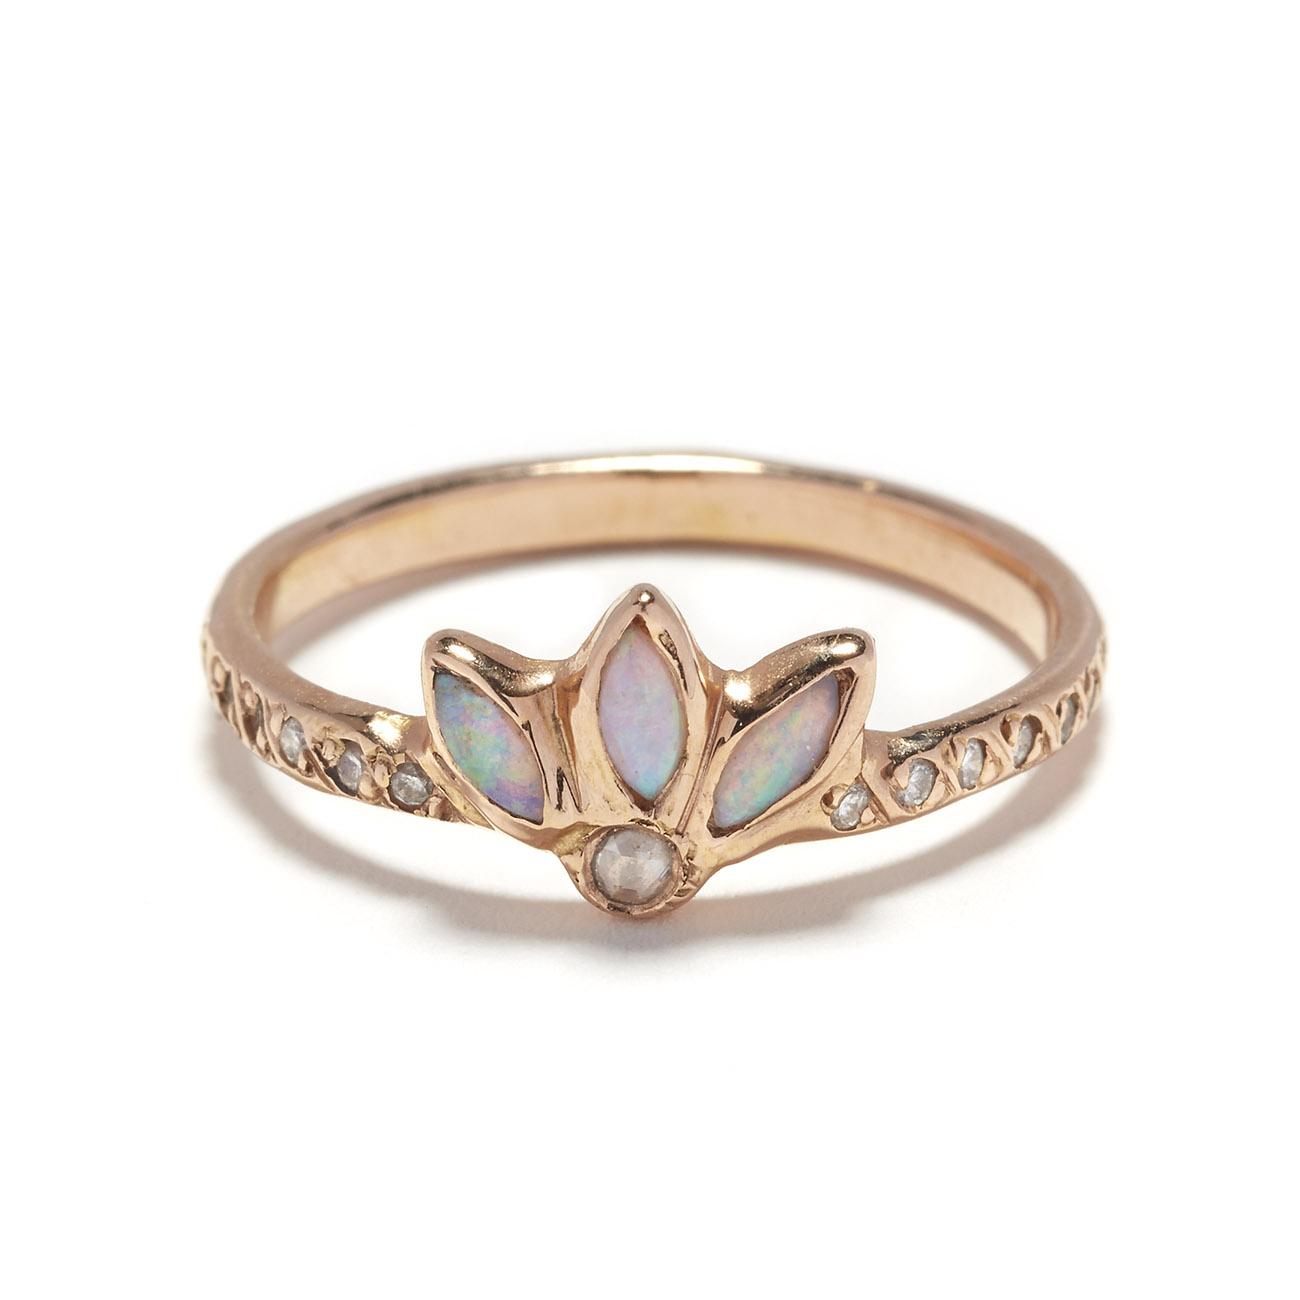 Opal Magic Flower Ring, $1,340 @elisasolomon.com